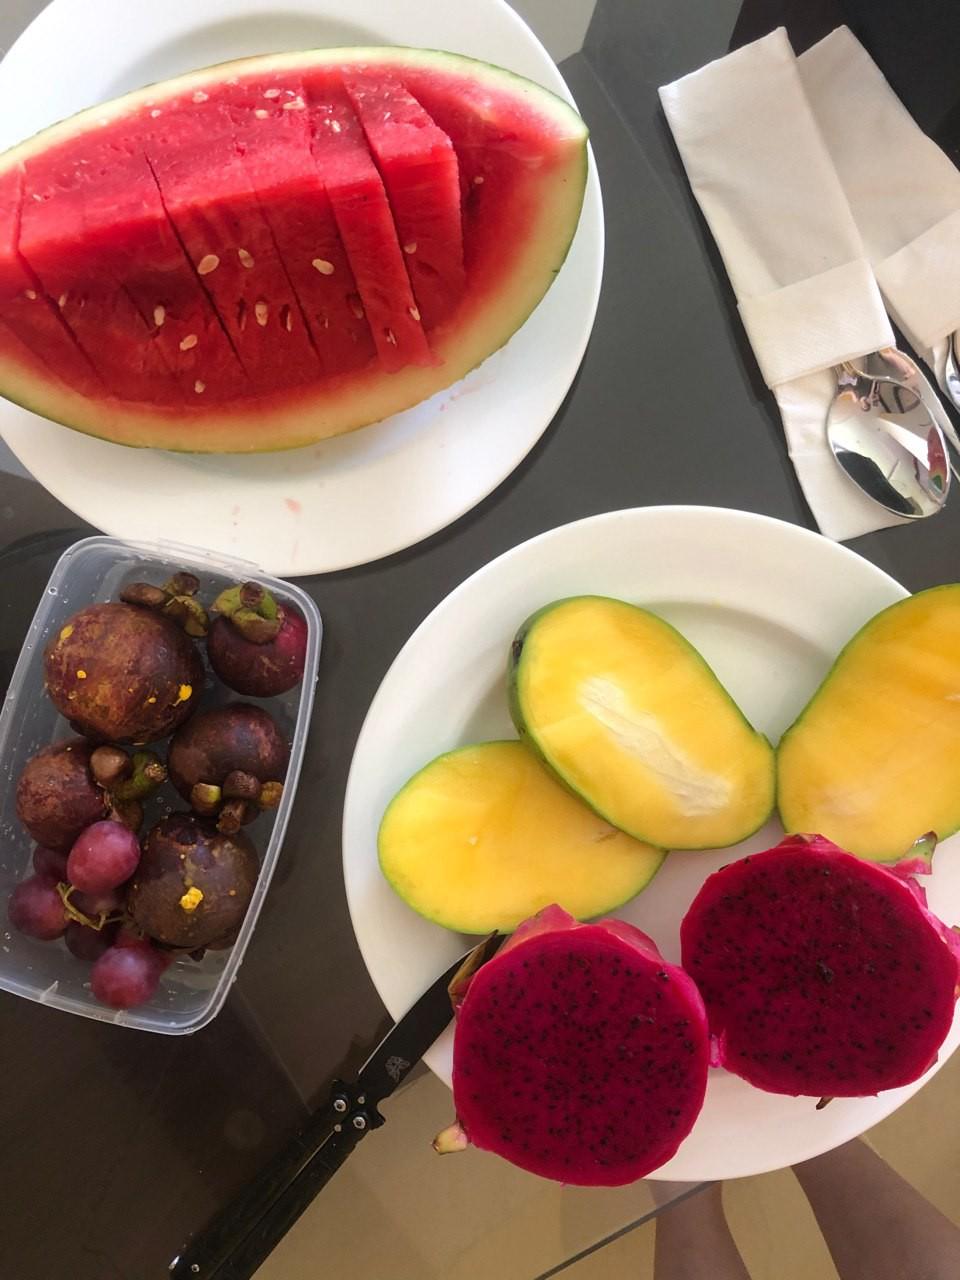 манга, драгон фрукт, мангустин